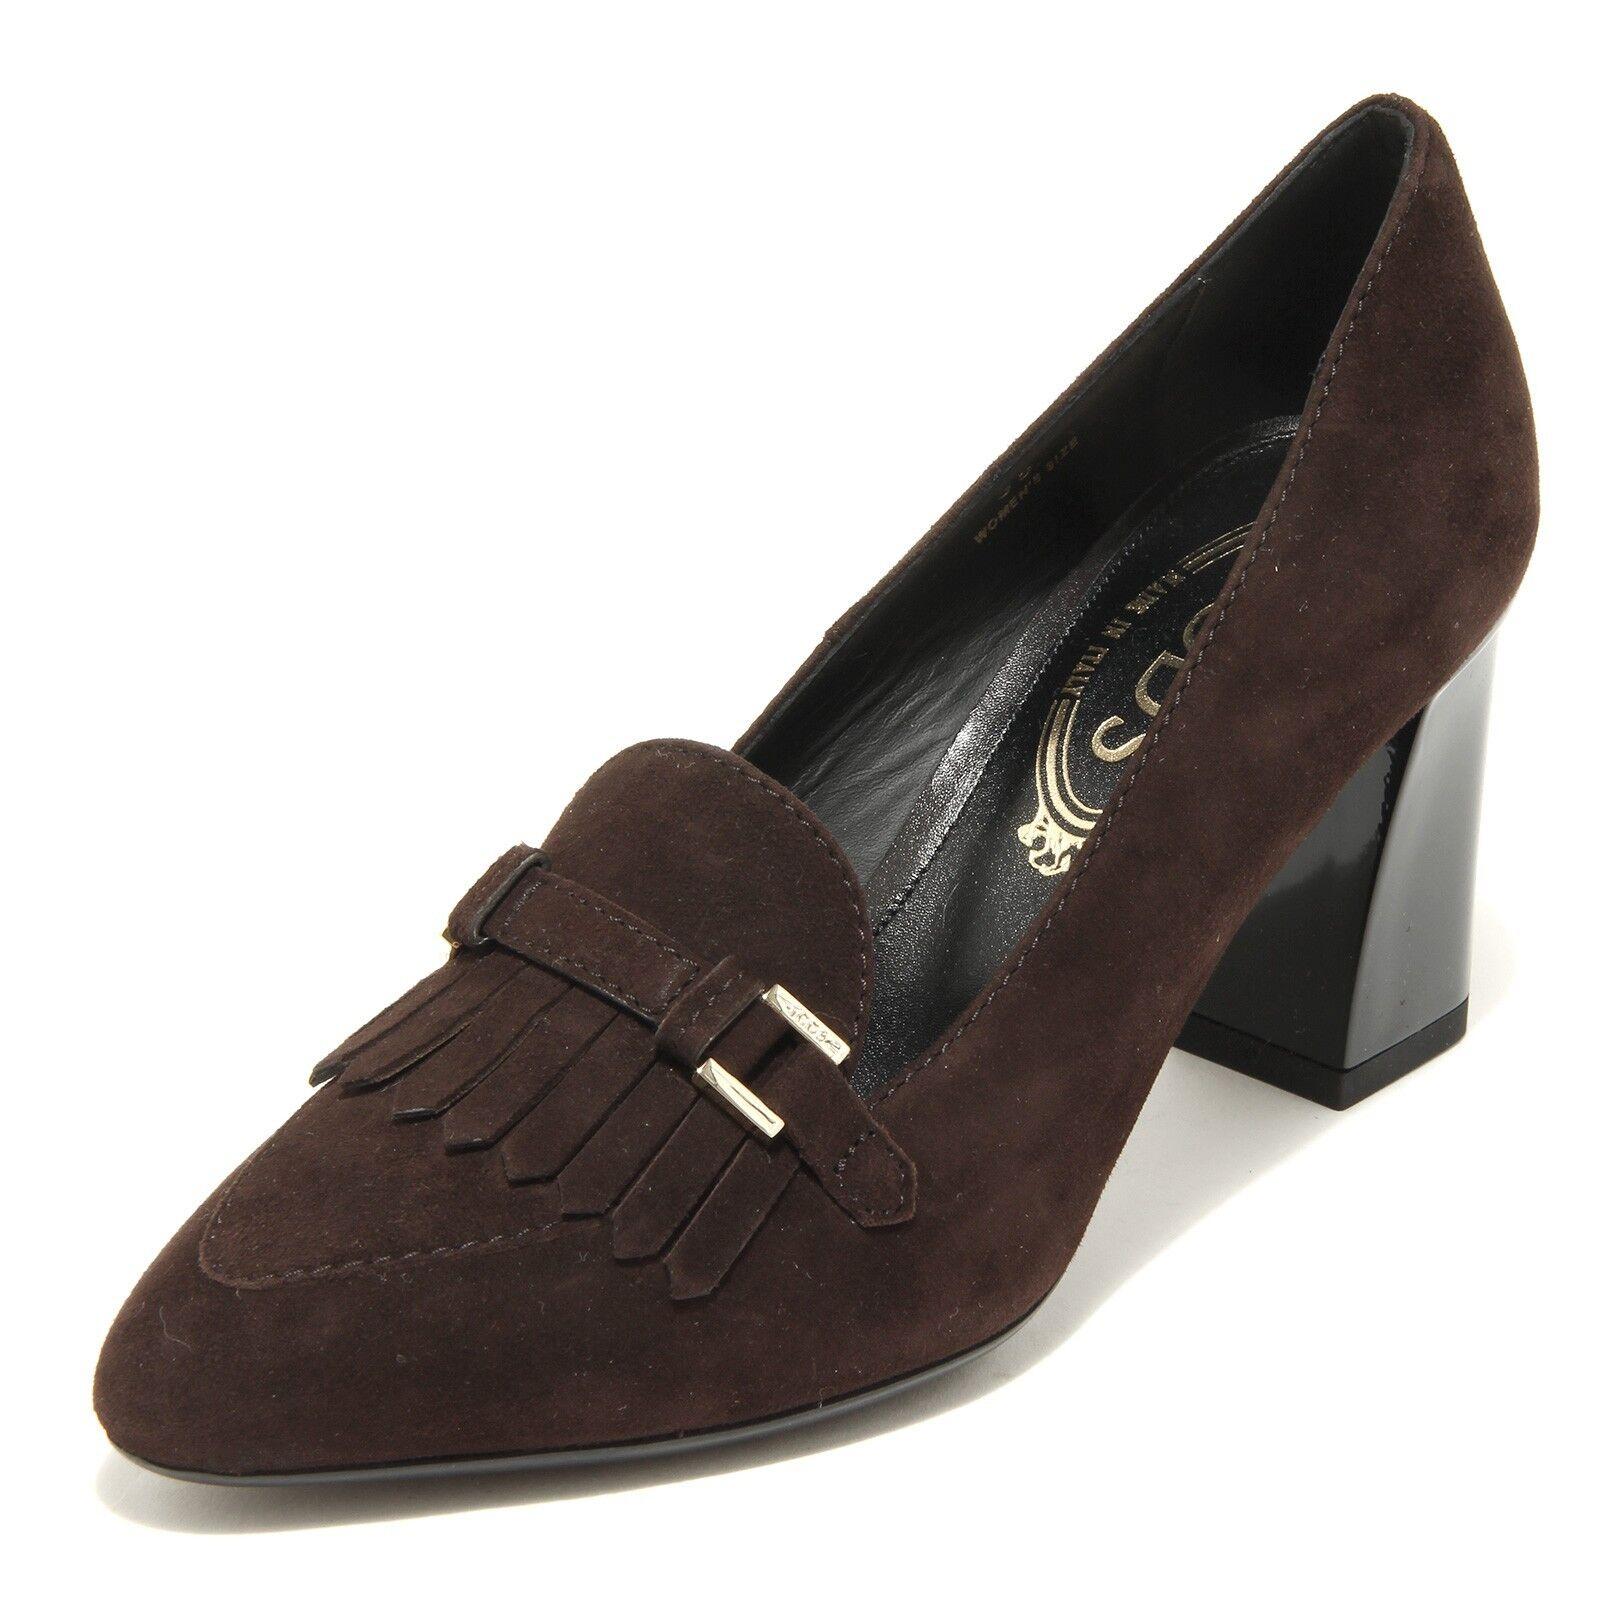 31143 scarpa decollete TOD 'S brown  scarpa 31143 donna shoes Donna marrone 3287e3